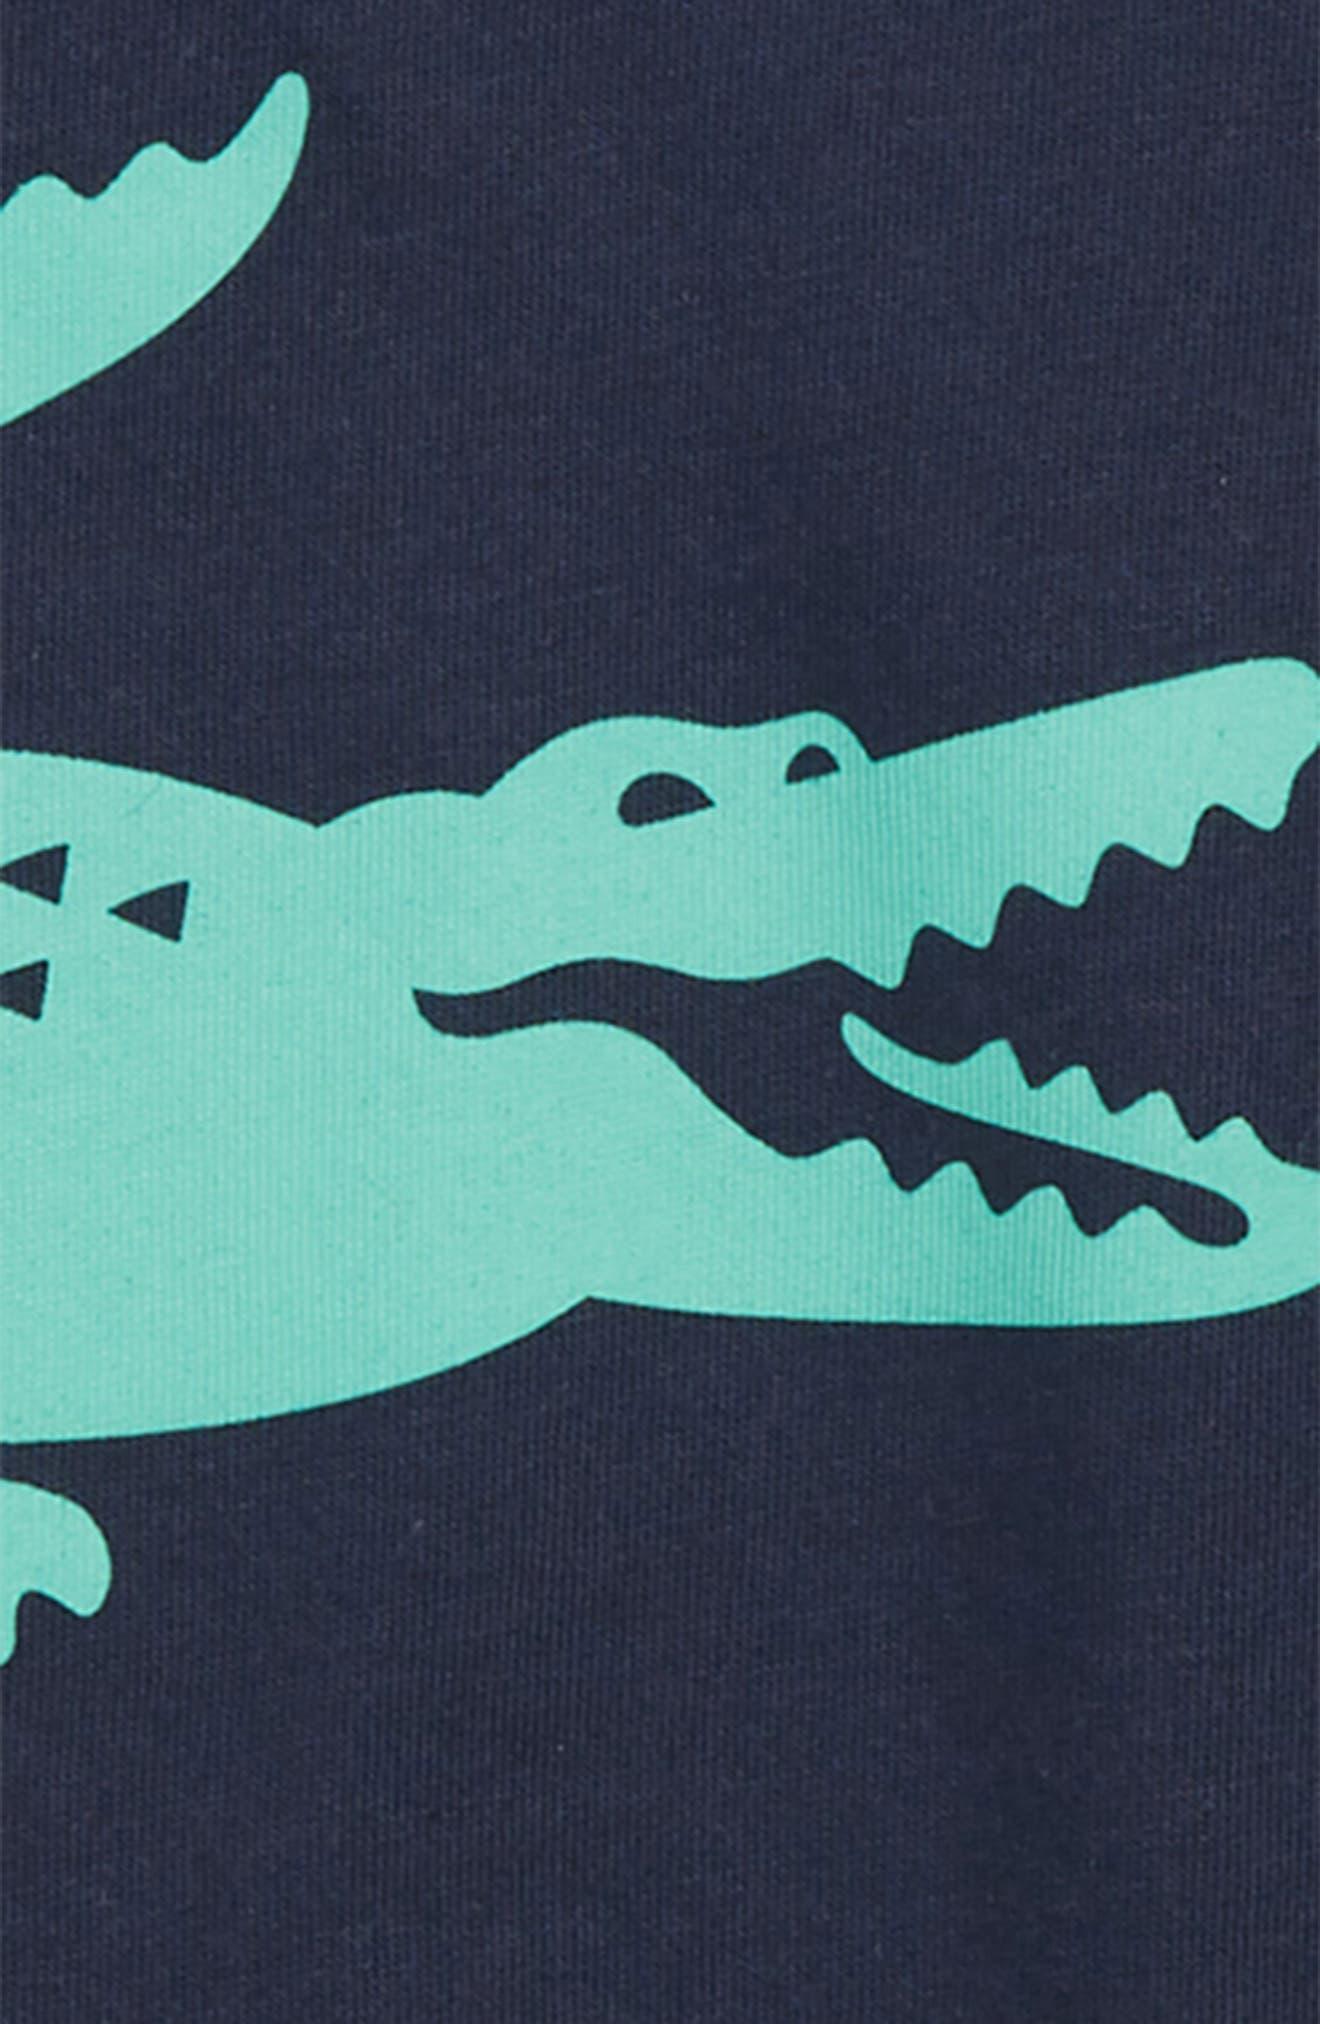 Croc Graphic T-Shirt,                             Alternate thumbnail 2, color,                             NAVY